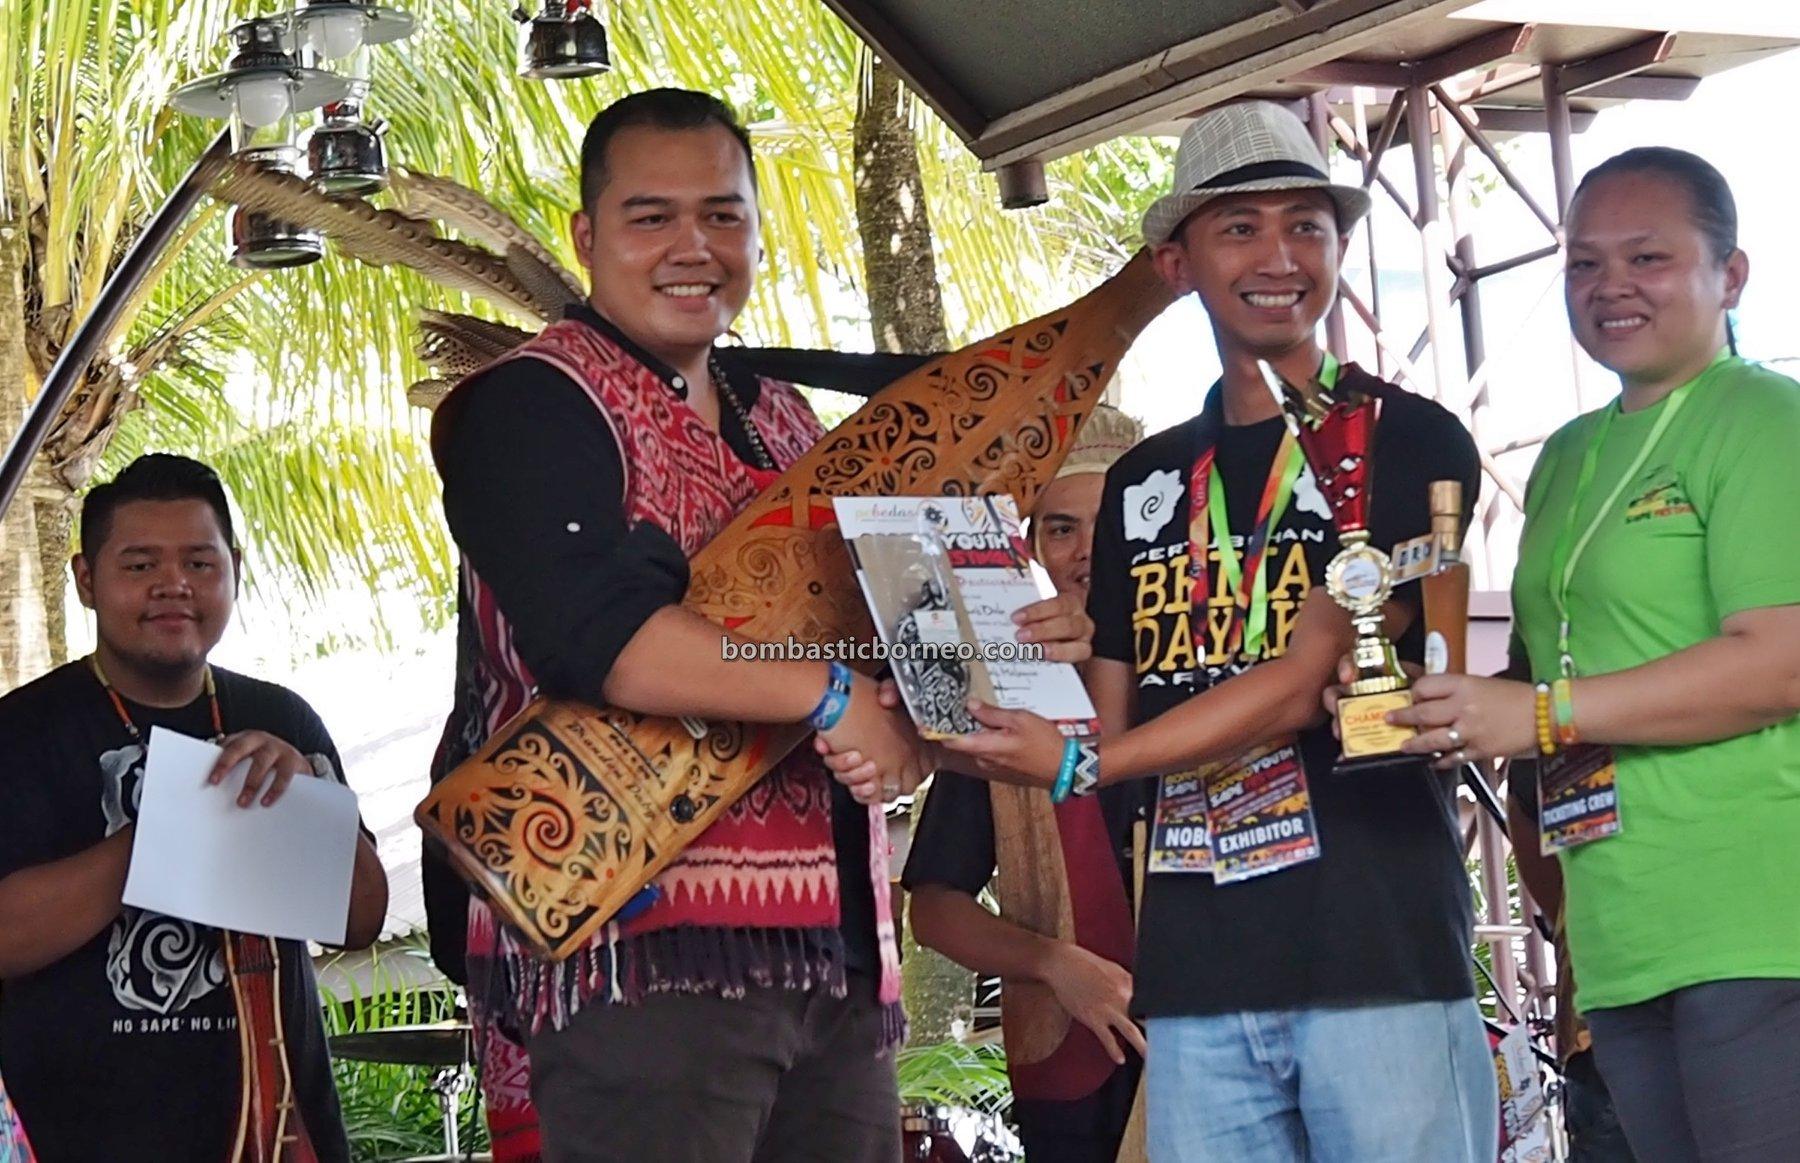 authentic, traditional, event, Ethnic, native, tribal, orang ulu, guitar, Sarawak, One Malaysia Cultural Village, Tourist attraction, travel guide, 探索婆罗洲达雅沙贝, 砂拉越原住民音乐, 马来西亚土著文化,